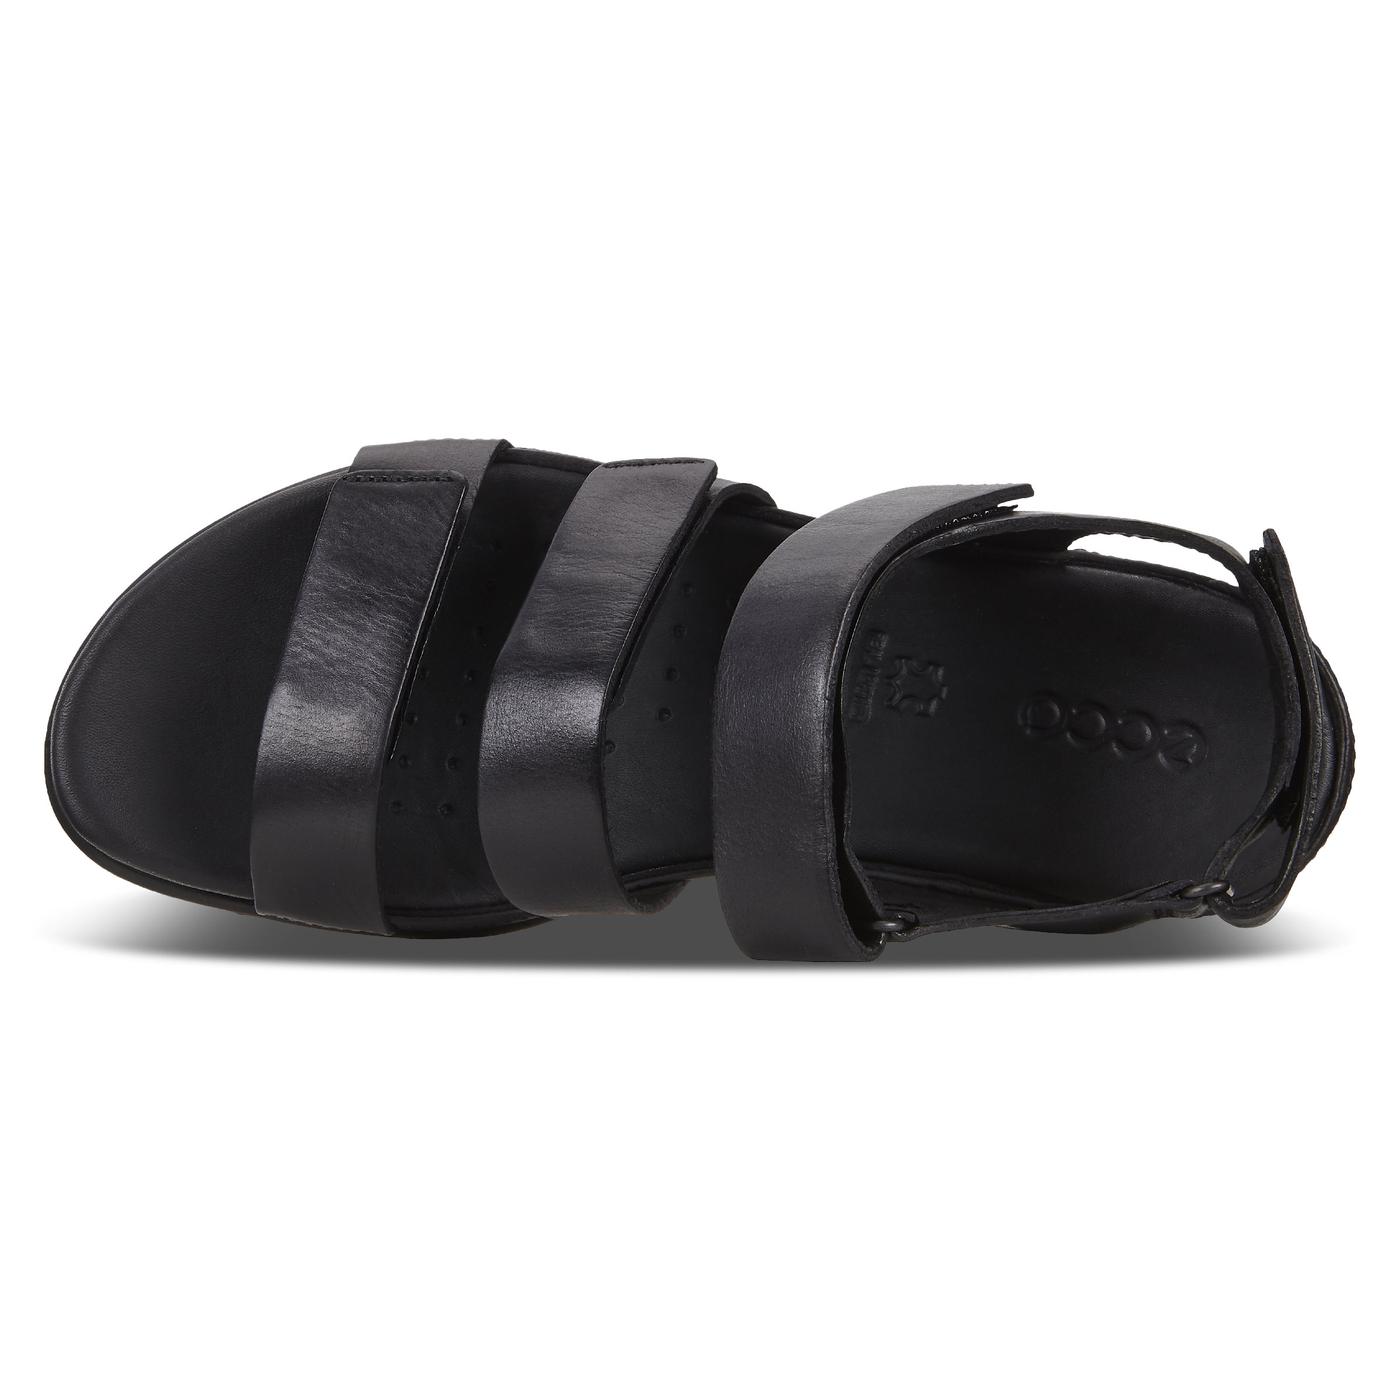 ECCO FLASH Flat Sandal